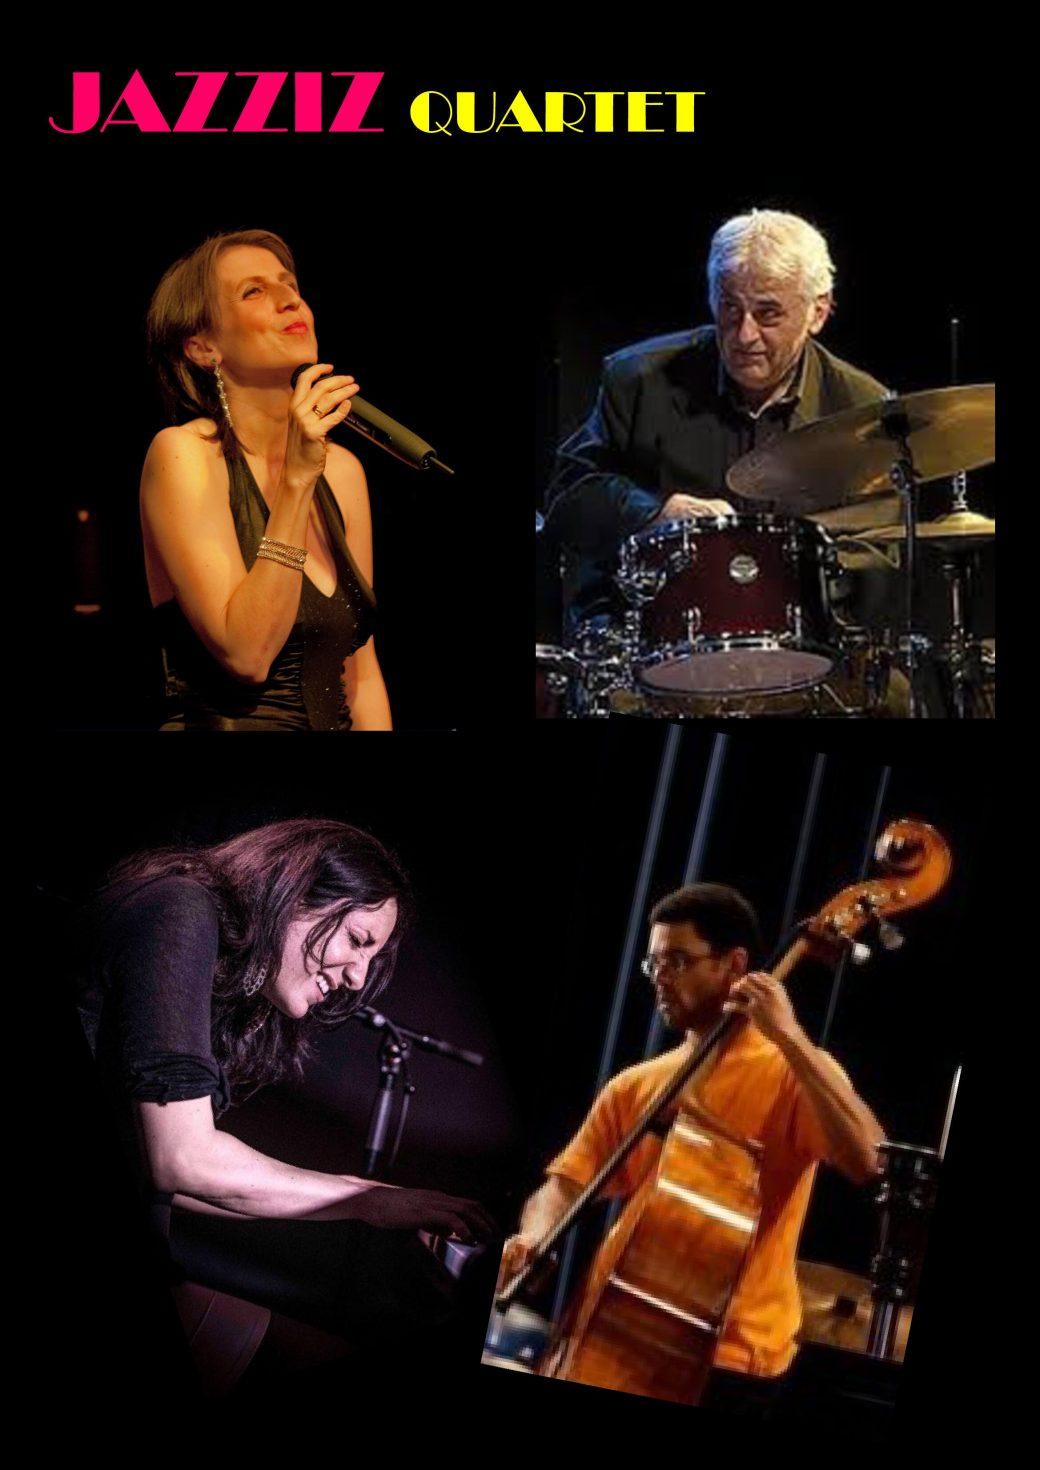 Jazziz Quartet